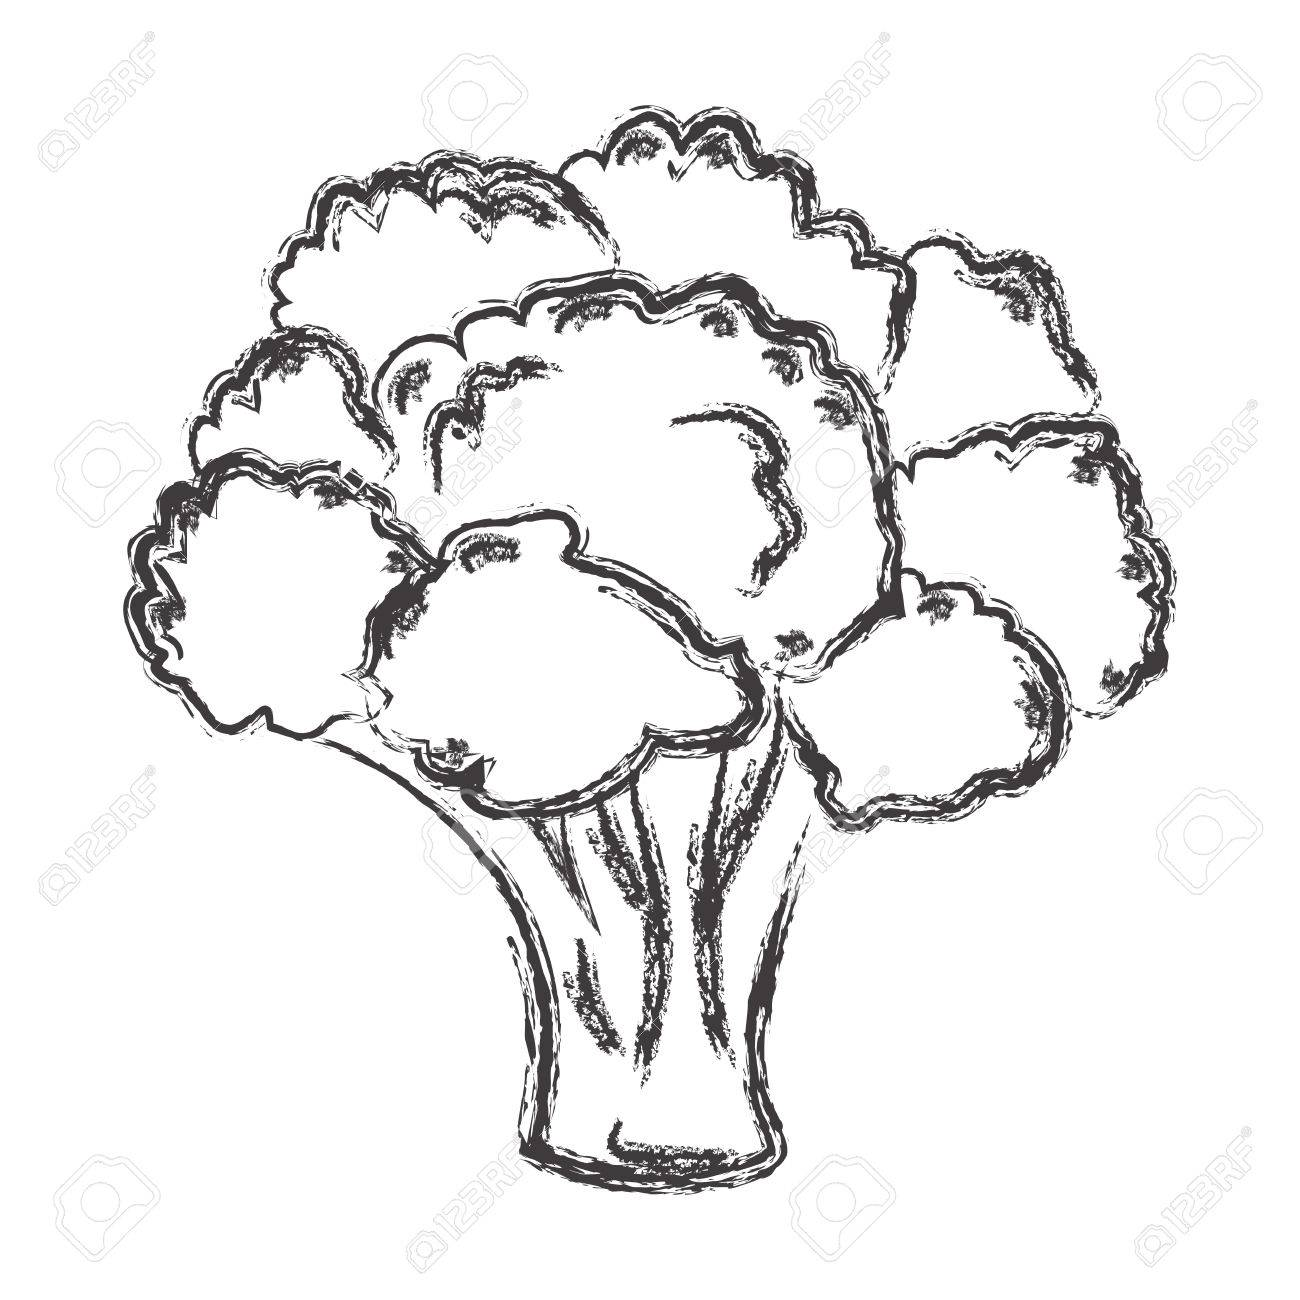 1300x1300 Atristic Hand Drawn Illustration Of Broccoli, Chalk Drawing